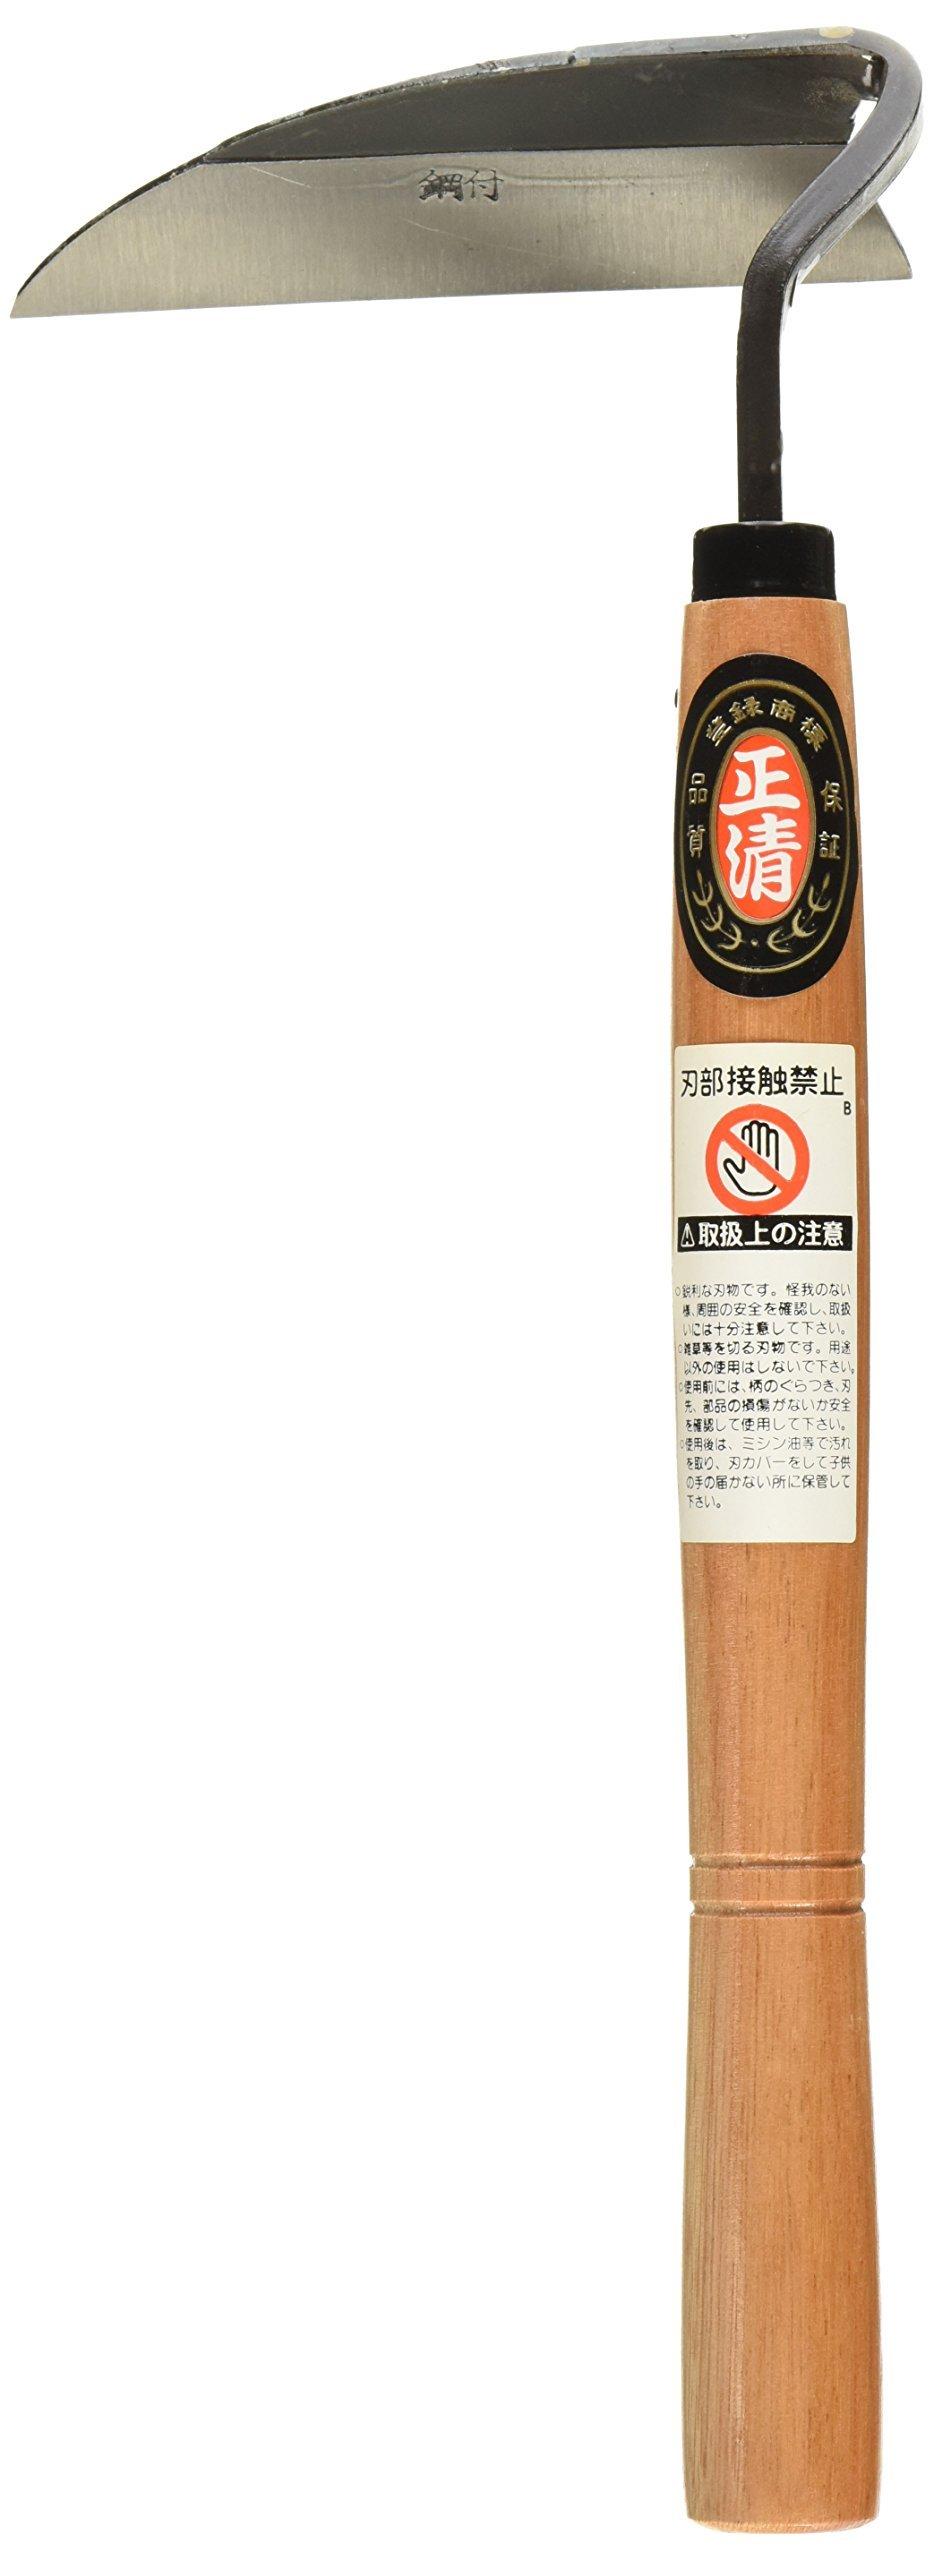 Senkichi Nejiri Gama Hoe